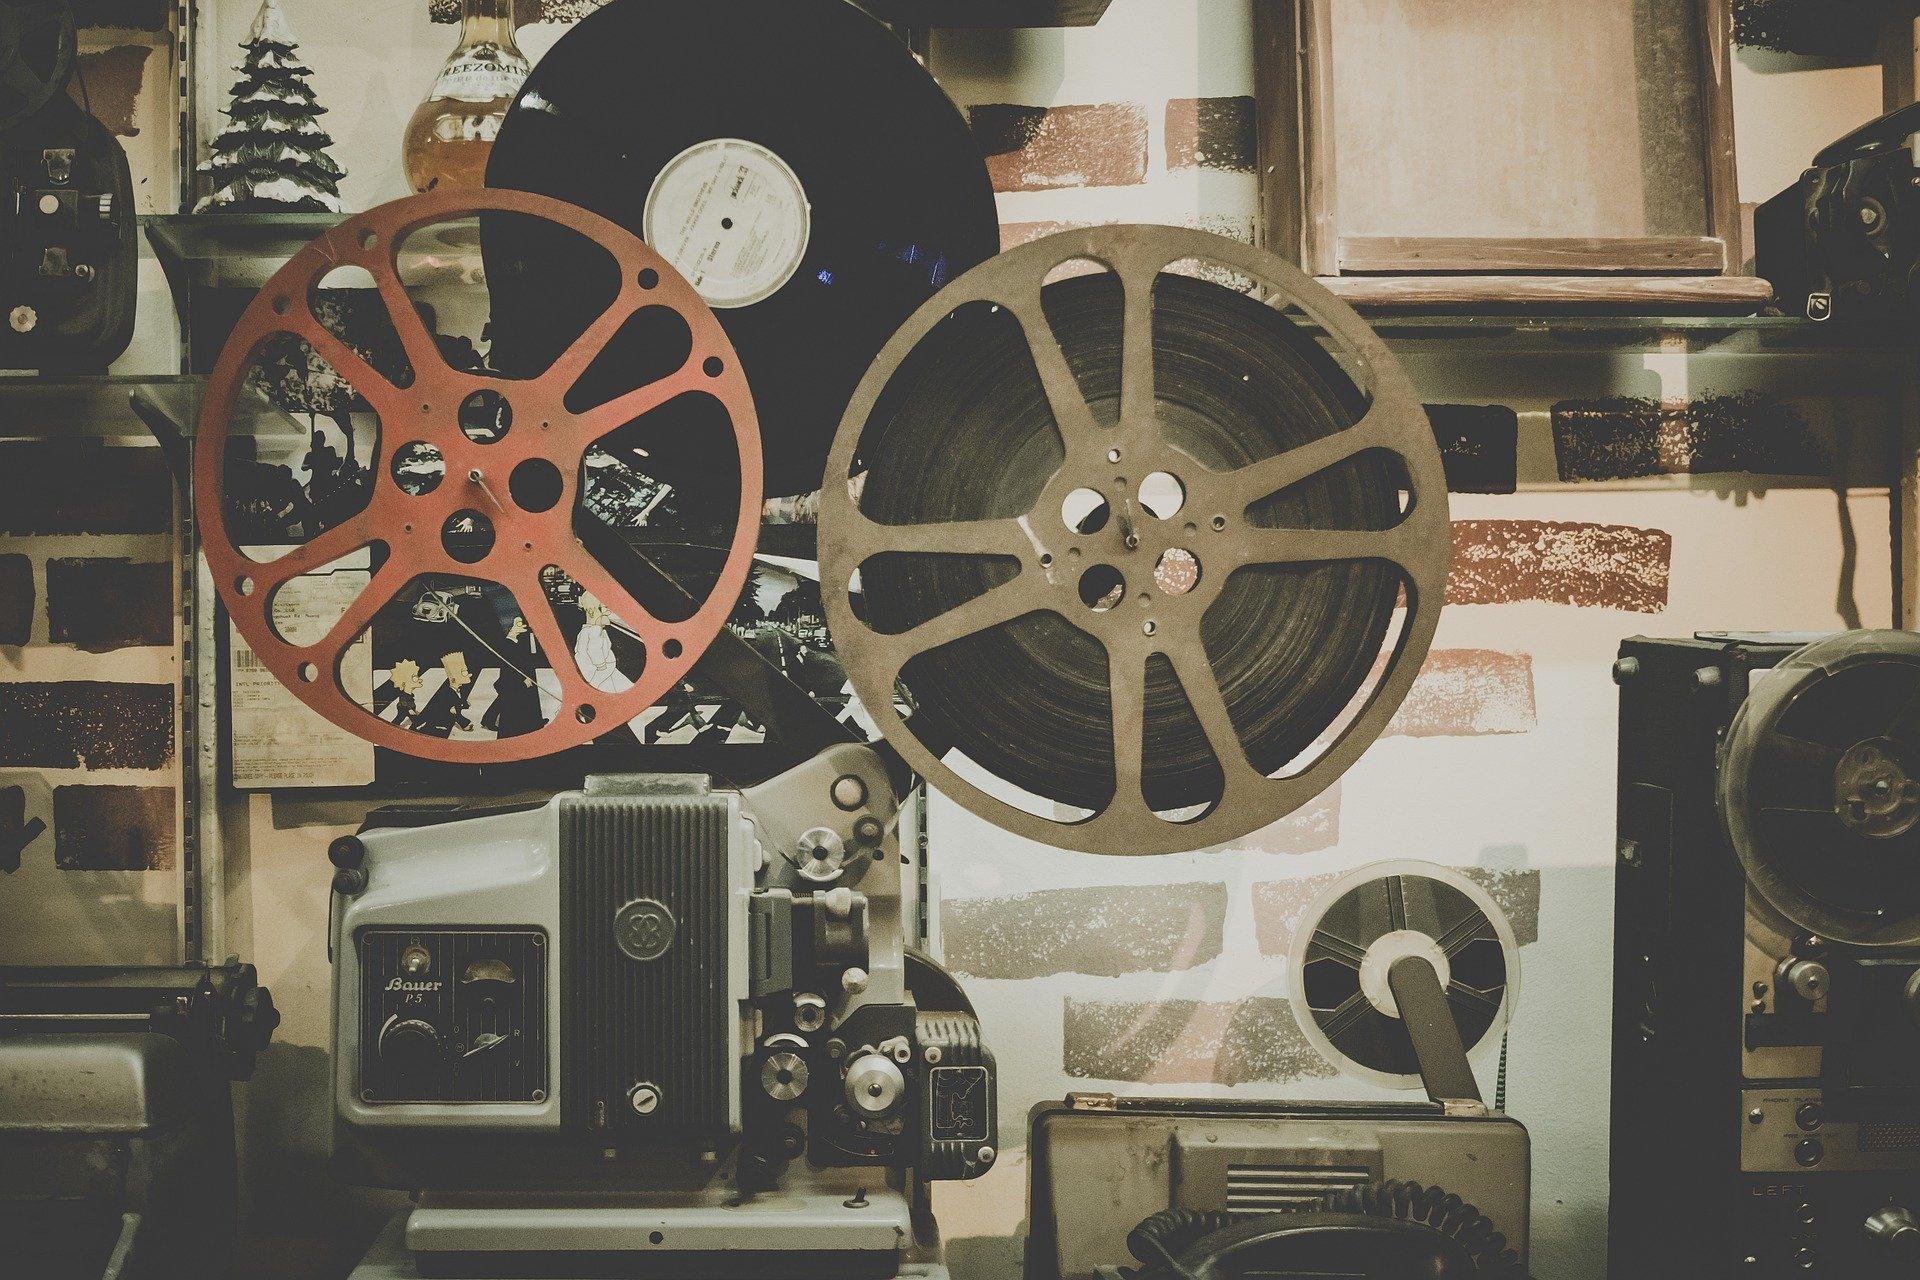 movie-918655-1920.jpg